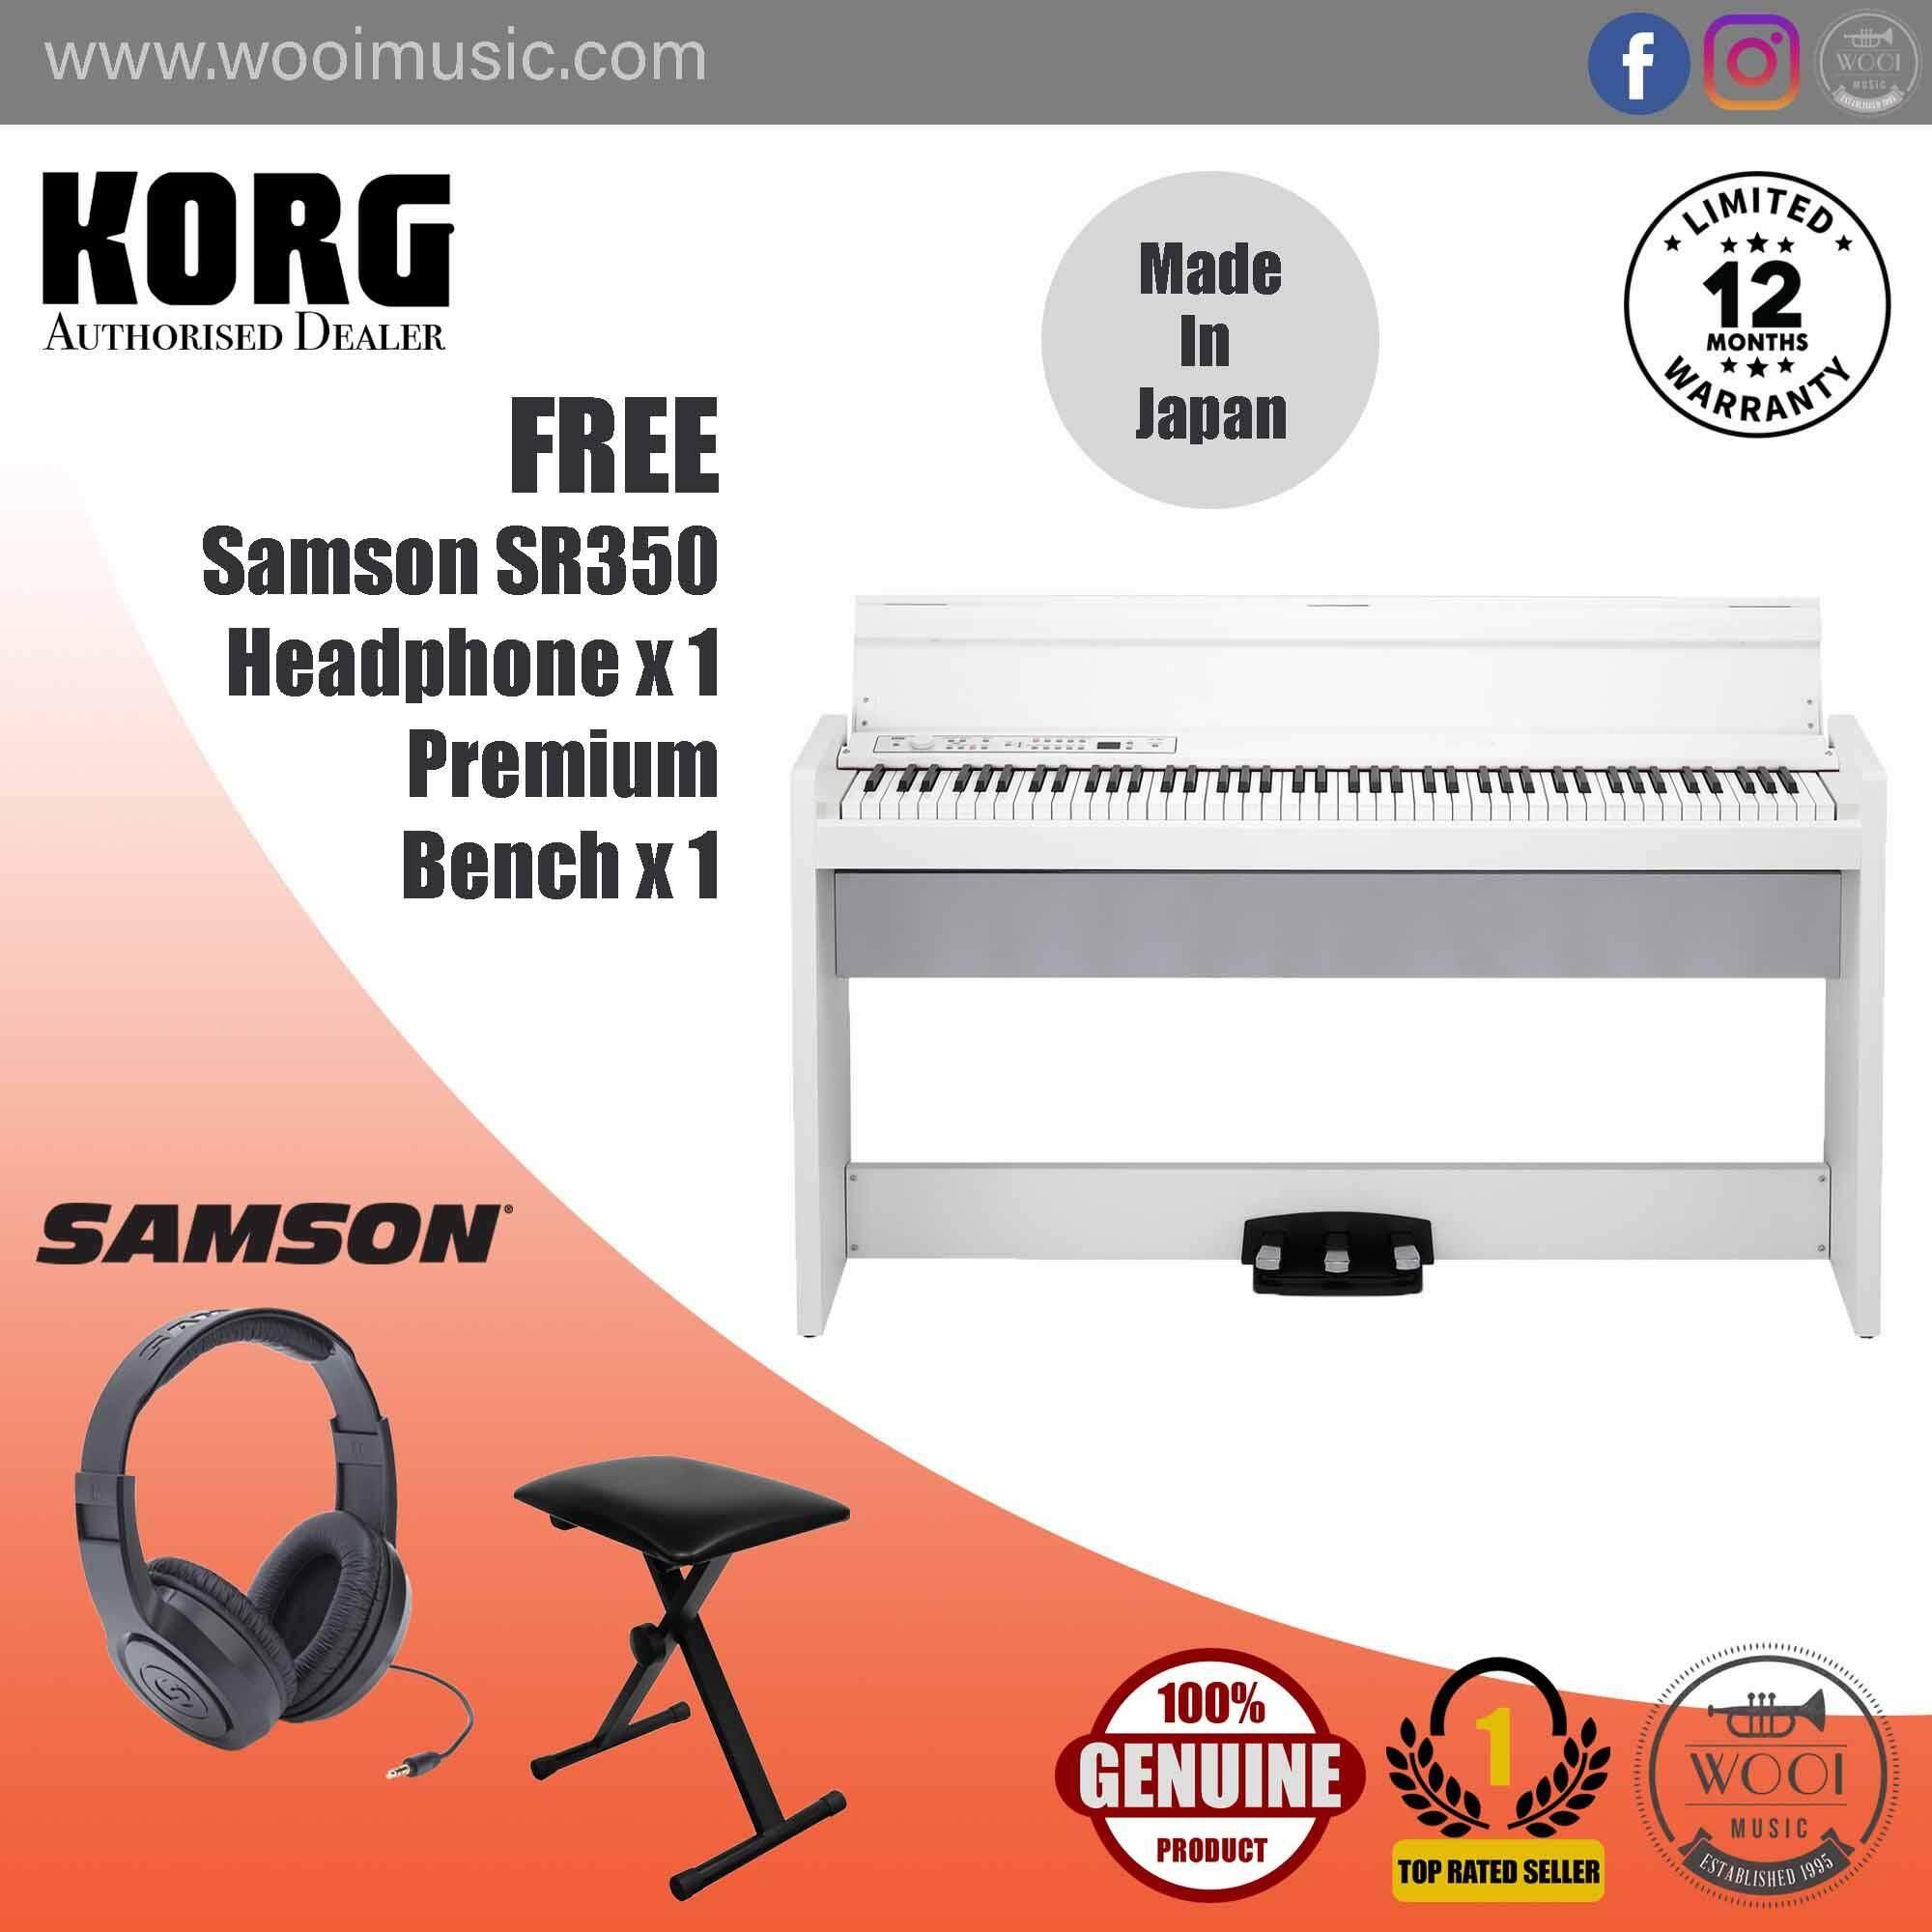 Korg LP380-WH Digital Piano White (88Keys) with Stand & 3 Unit Pedal (Made In Japan) (FREE Samson SR350 Headphone & Premium Keyboard Bench)